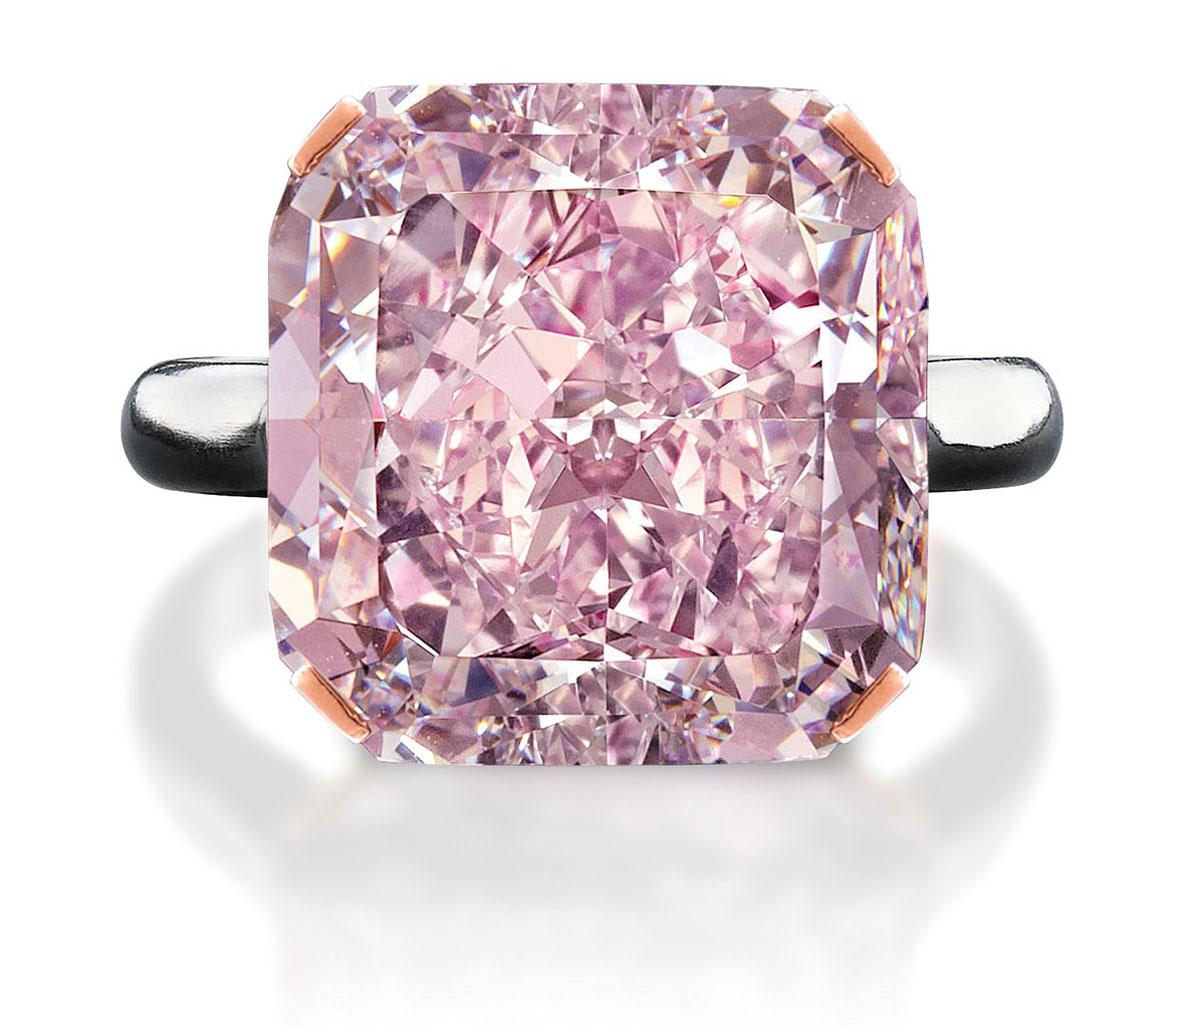 Luxury Life Design: World\'s largest pink diamonds